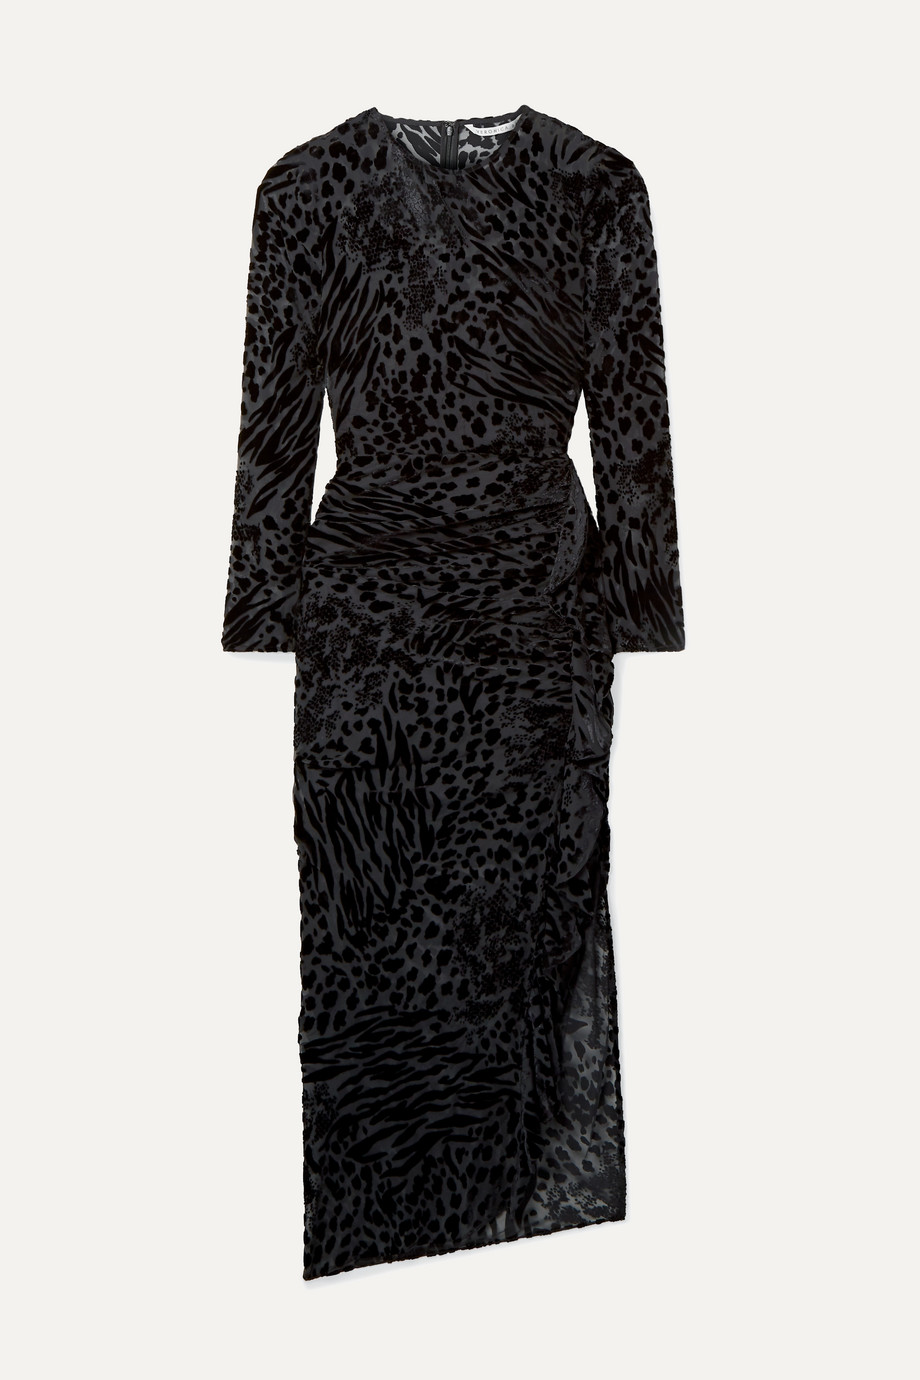 Veronica Beard Lala ruffled flocked chiffon midi dress